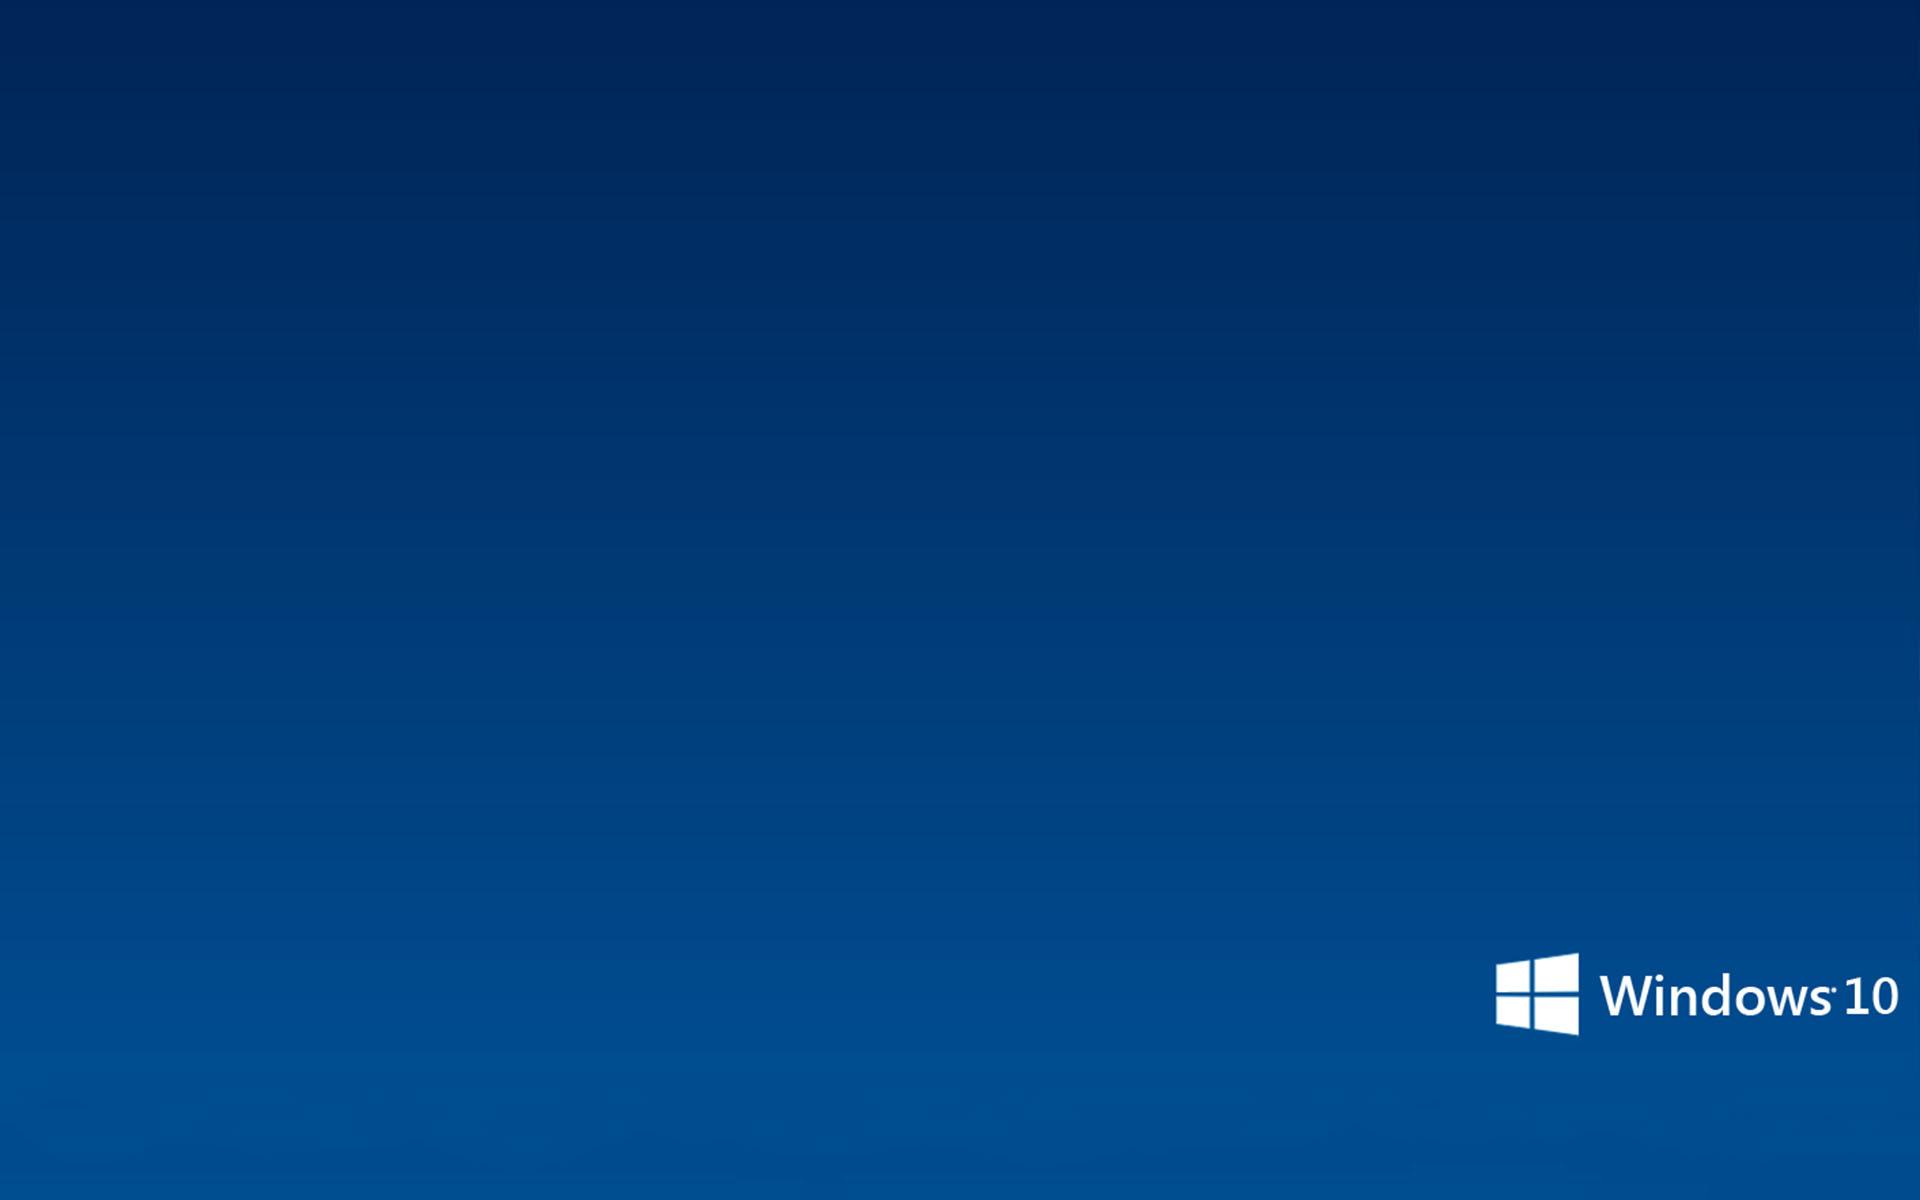 Microsoft windows 10 wallpaper wallpapersafari for Microsoft windows 10